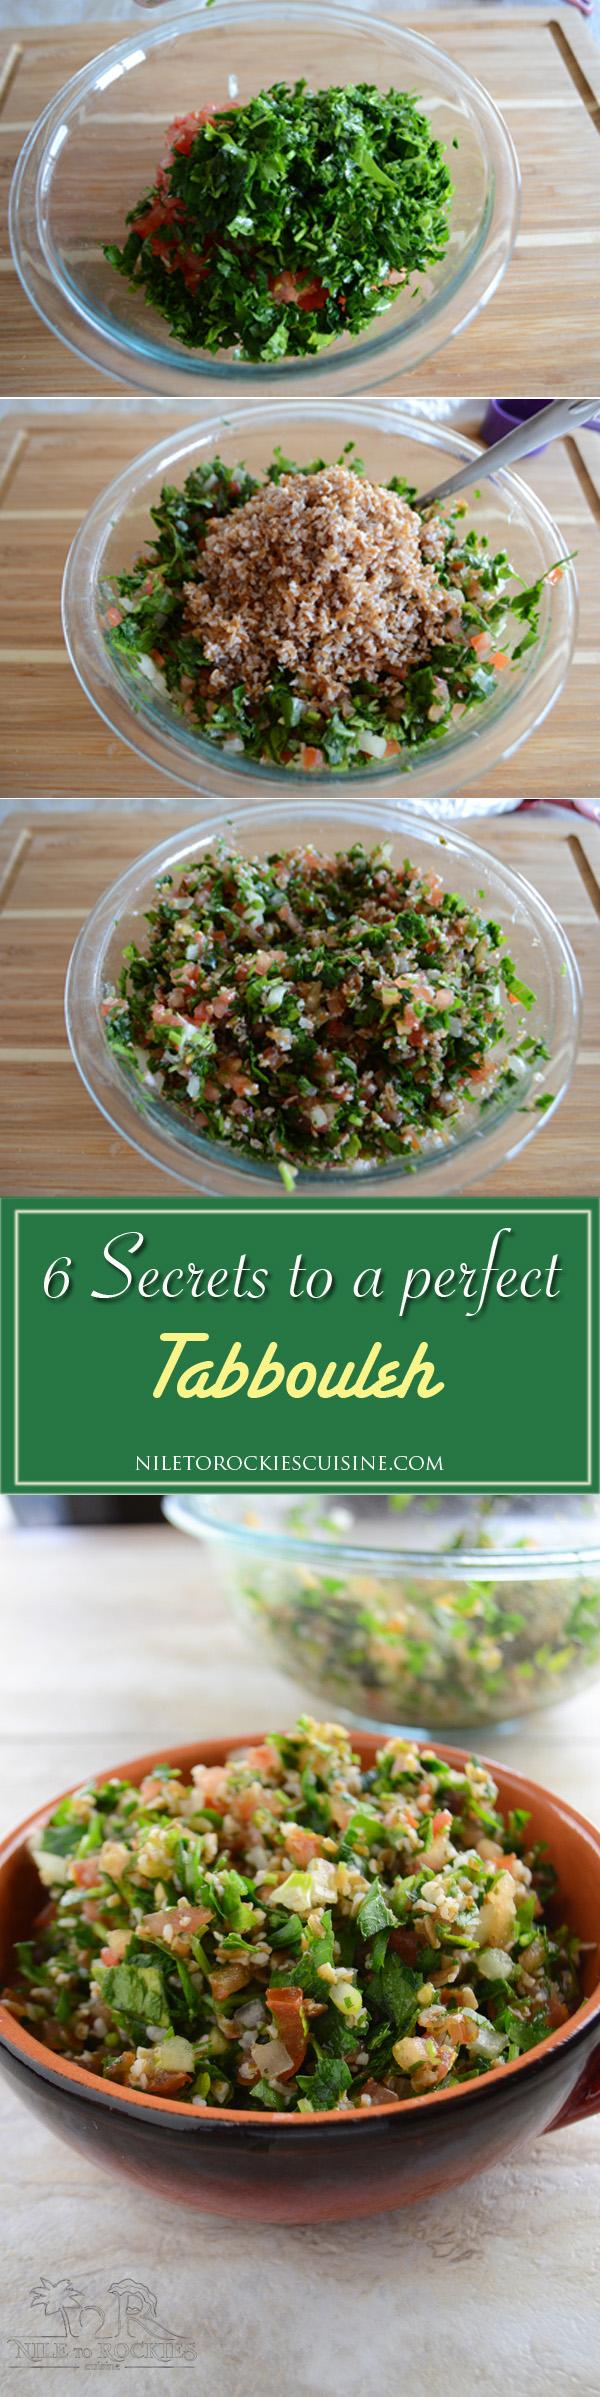 Lebanese tabbouleh recipe